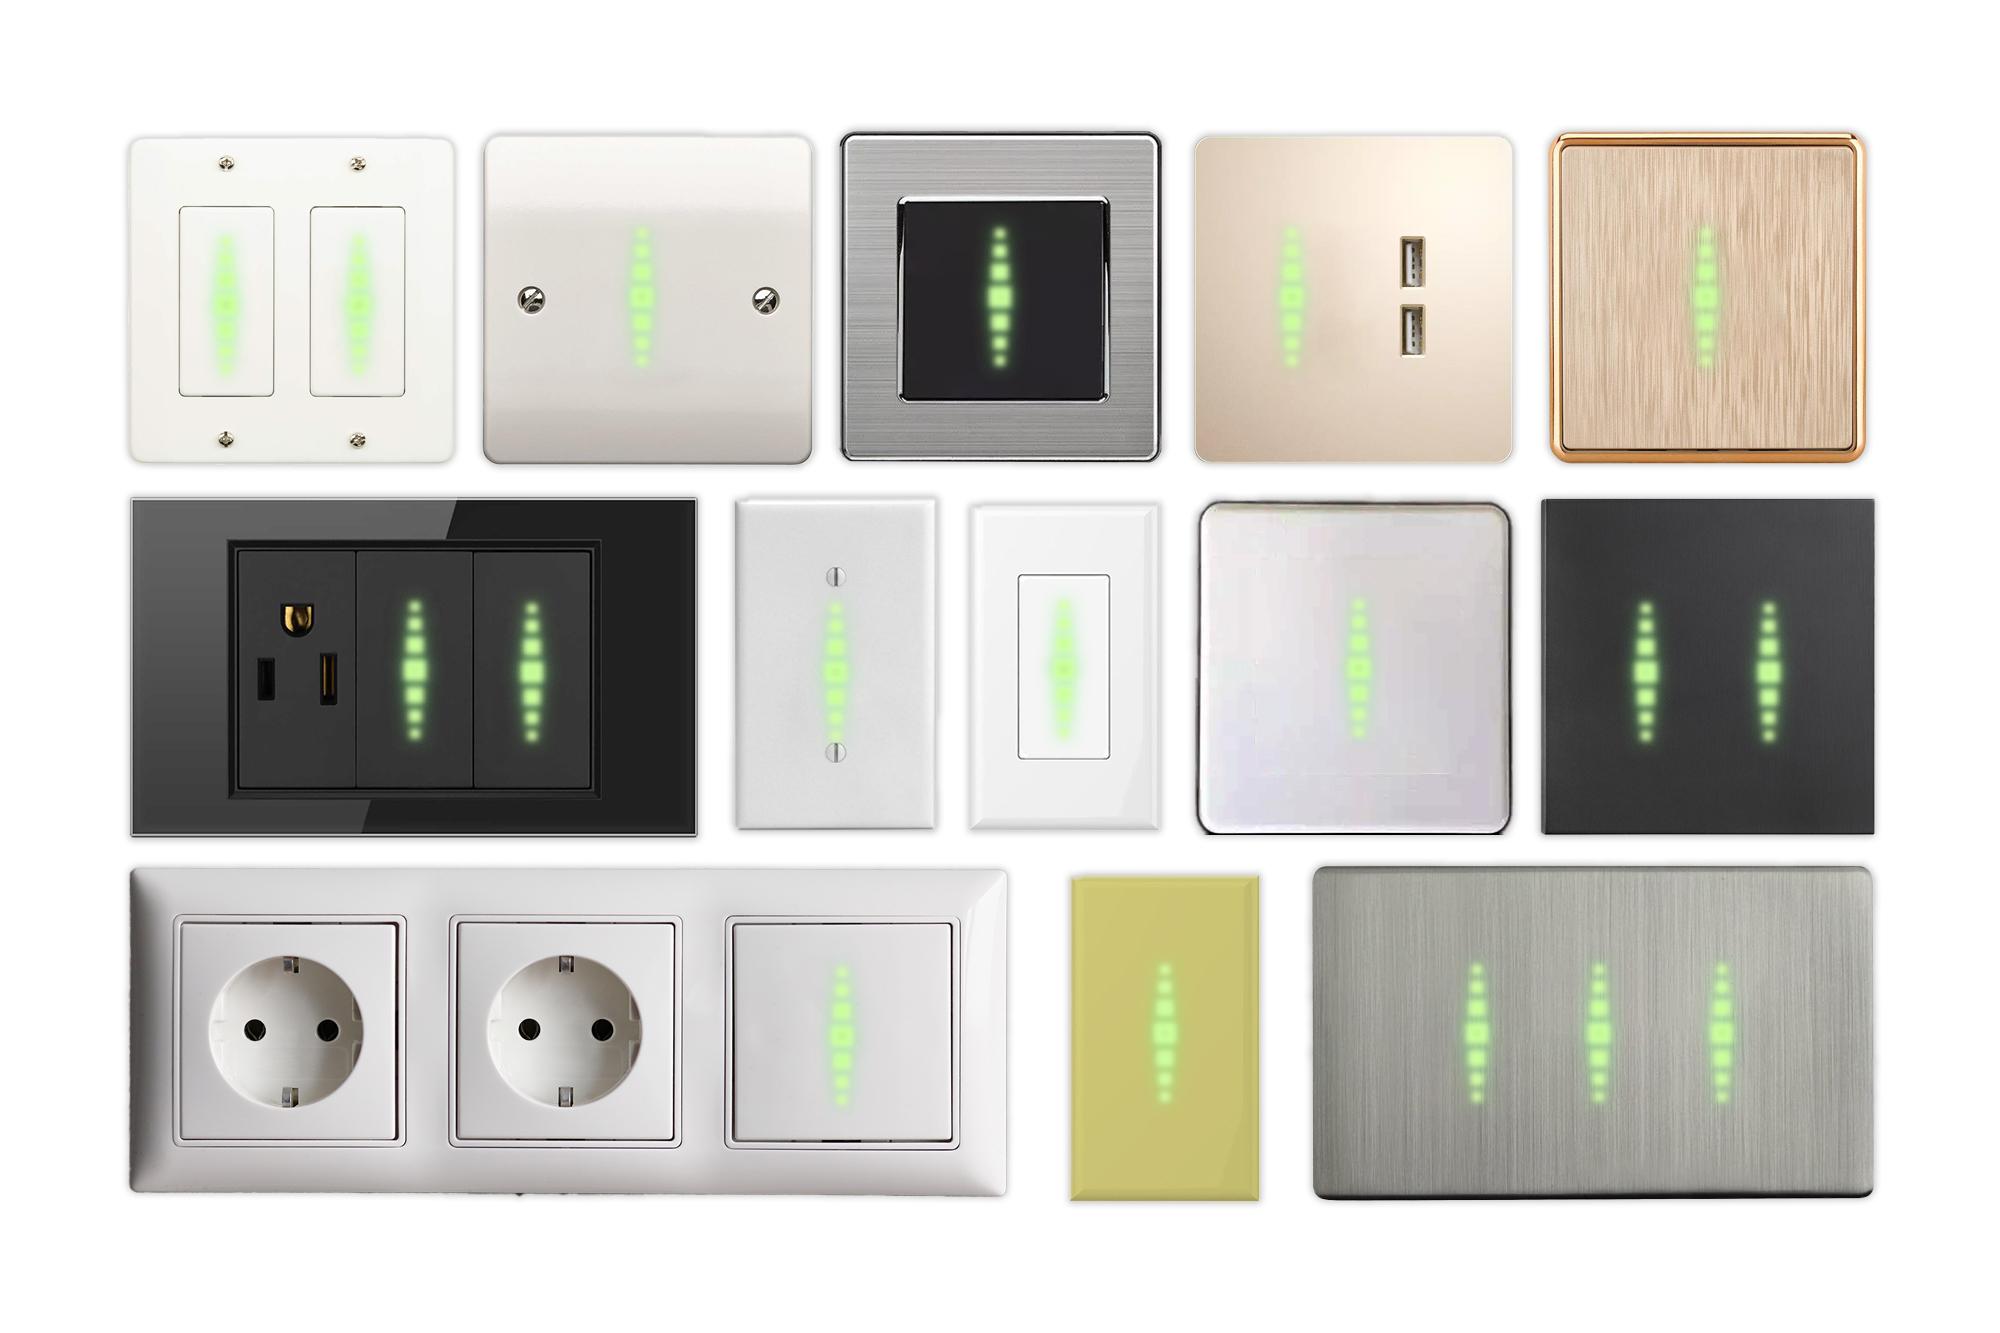 sockets image